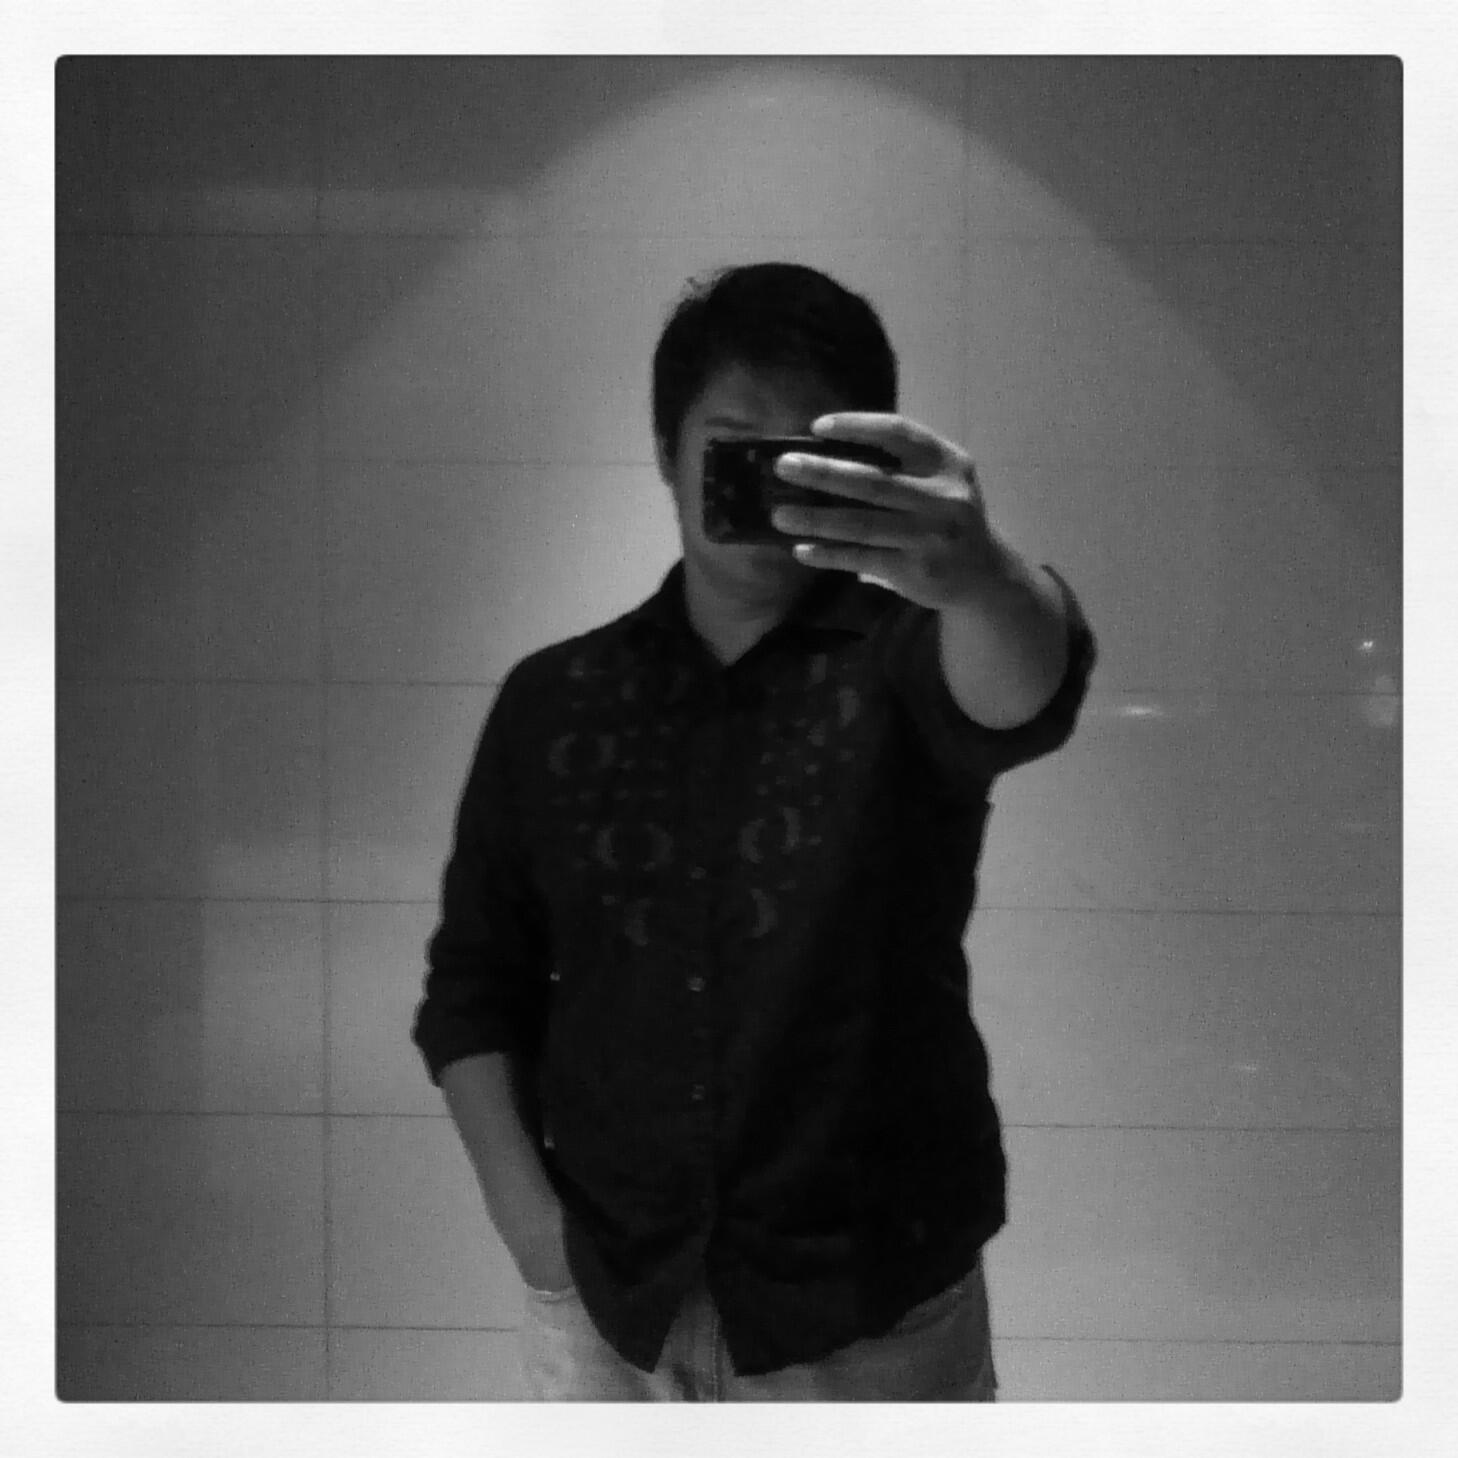 Hard Rock Hotel restroom